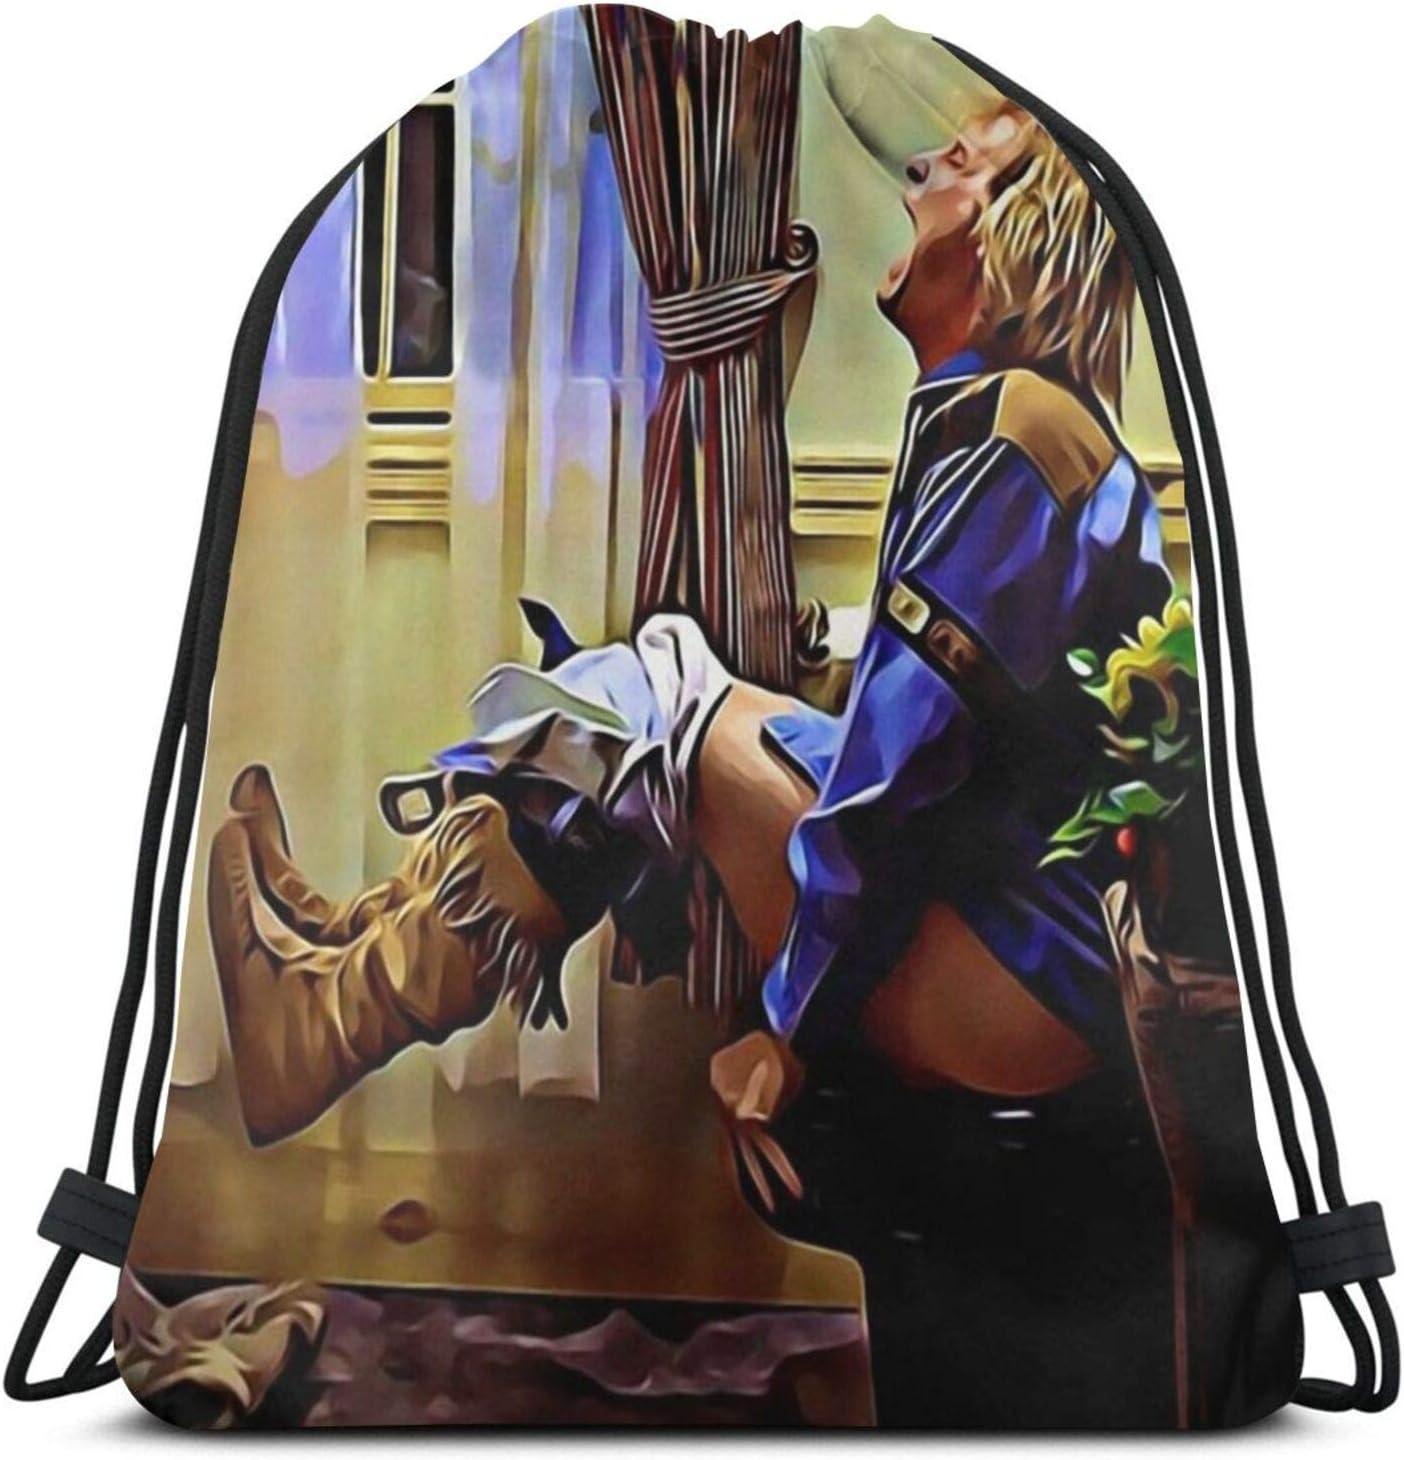 Aizawa Dumb and Dumber Painting Drawstring Bag Sport Gym Backpack Storage Goodie Cinch Bags